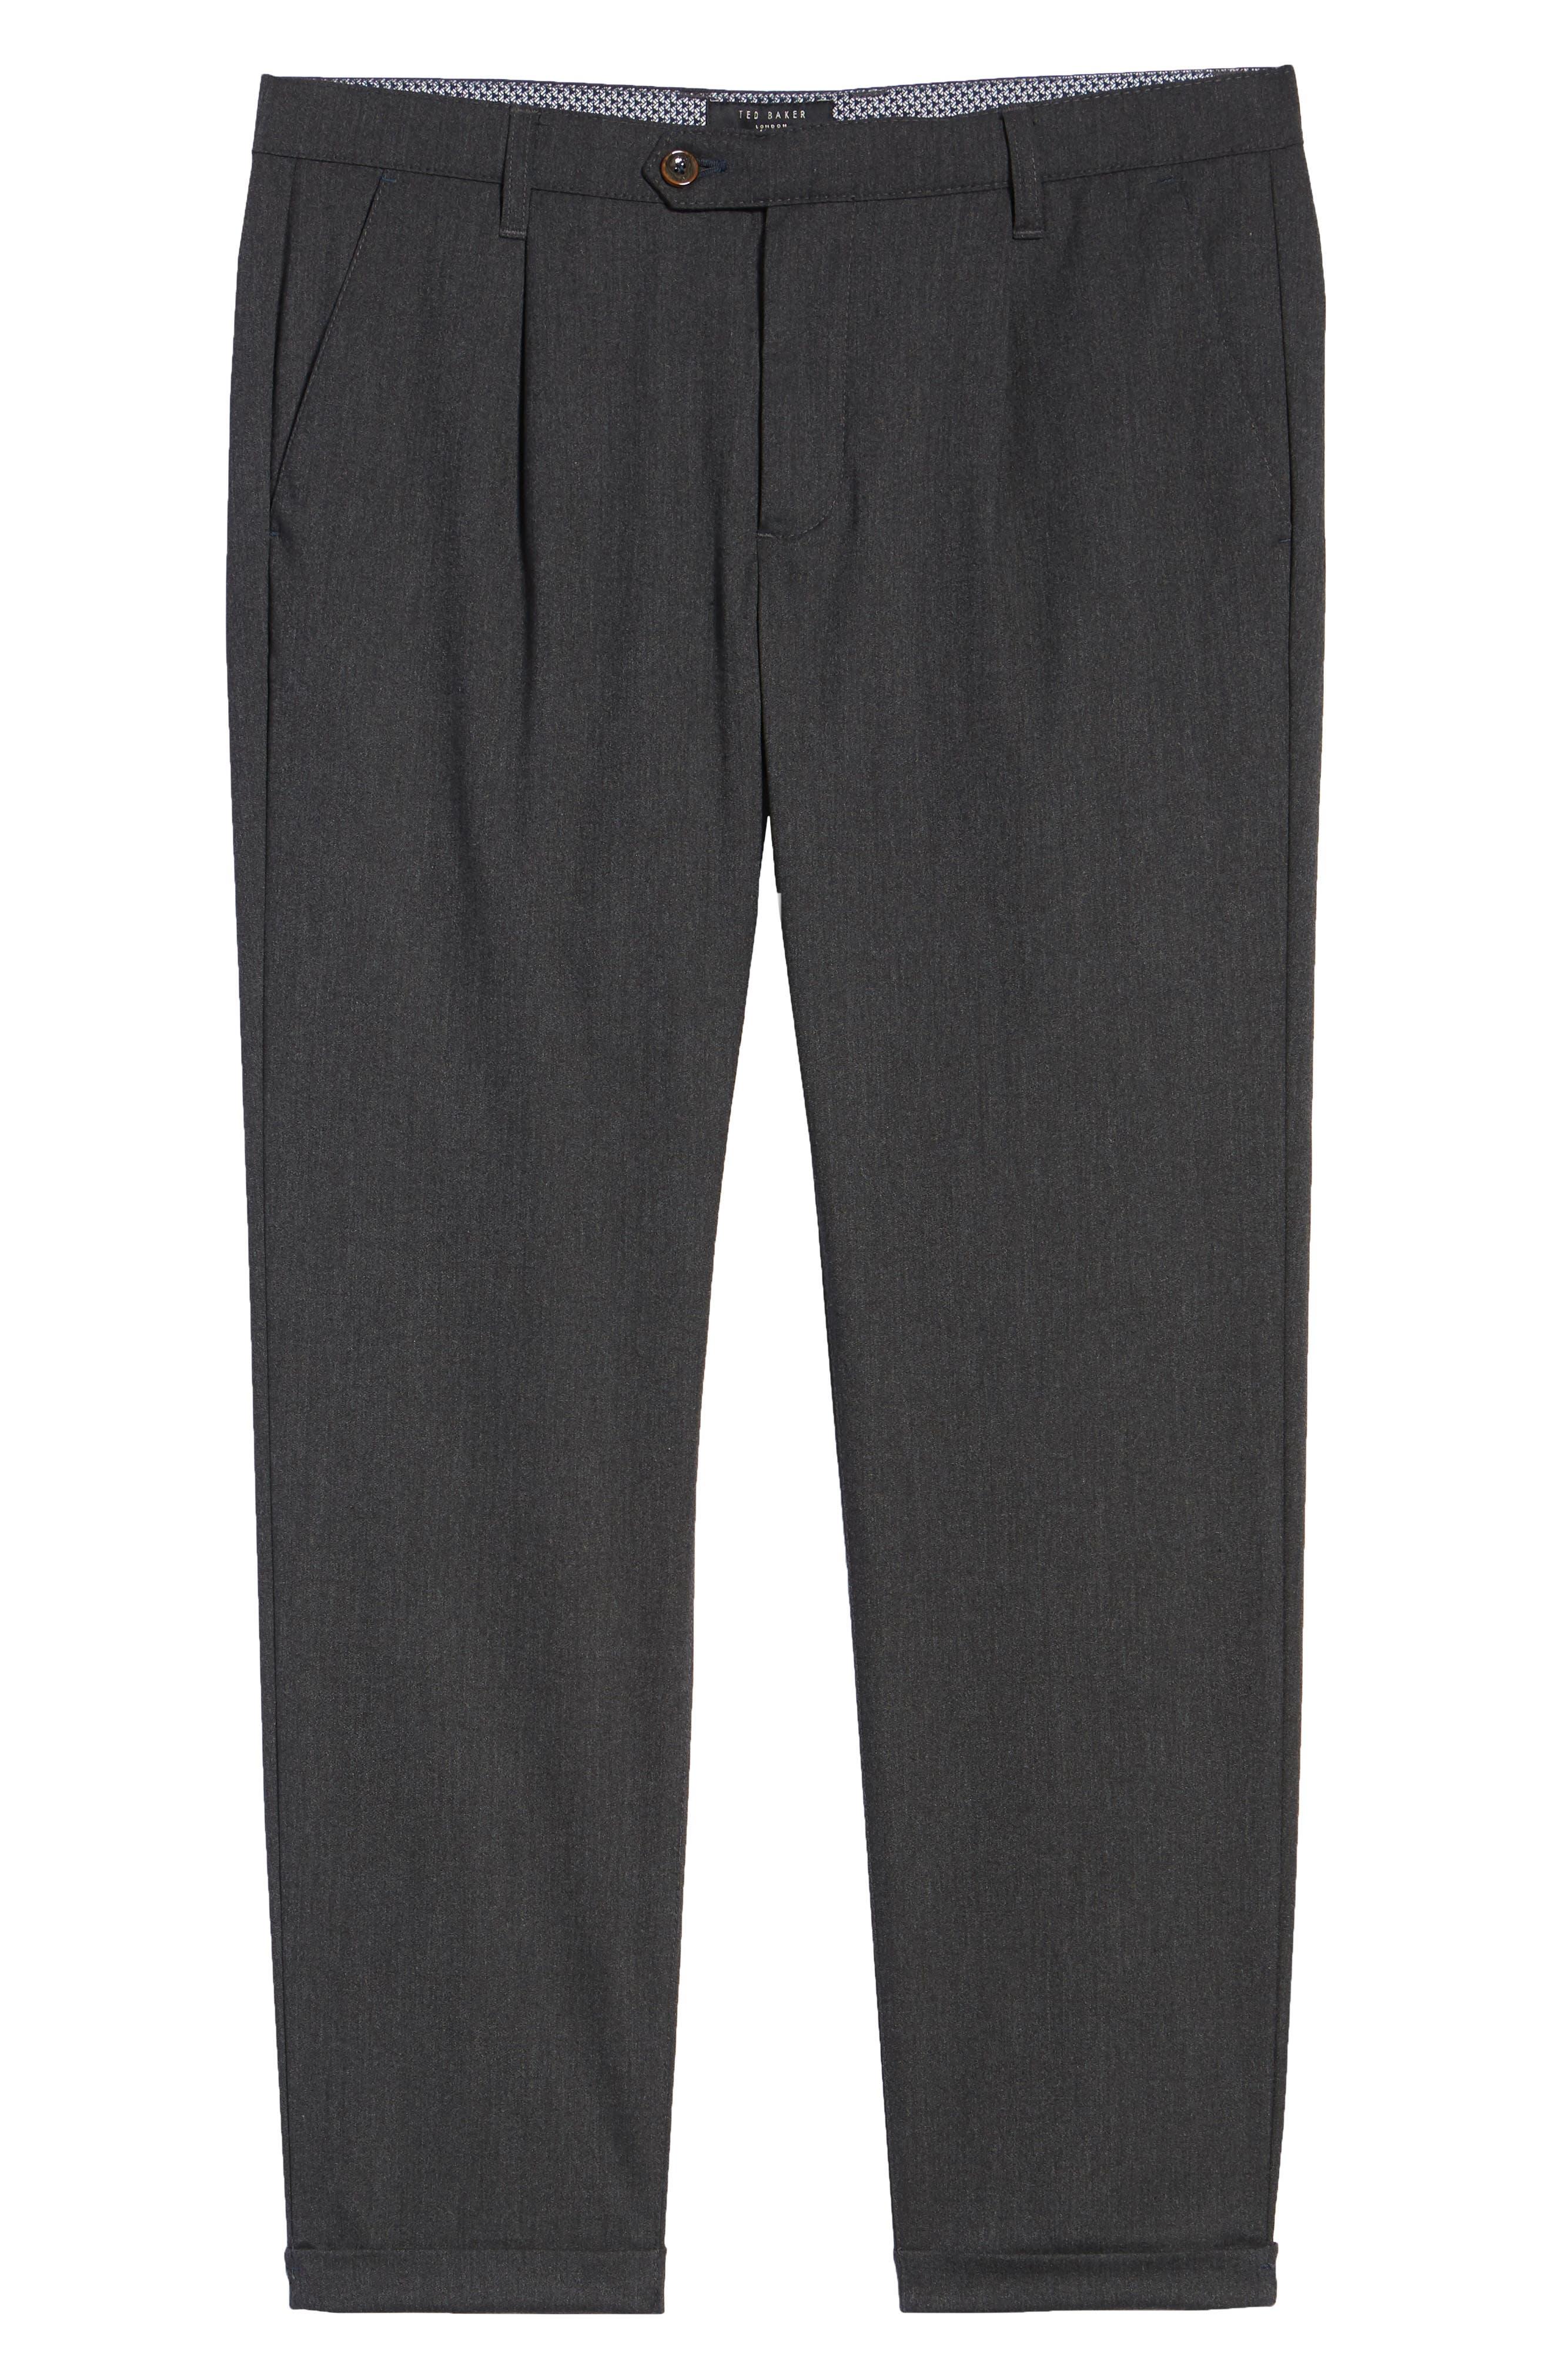 Champi Pleated Cropped Pants,                             Alternate thumbnail 6, color,                             Black